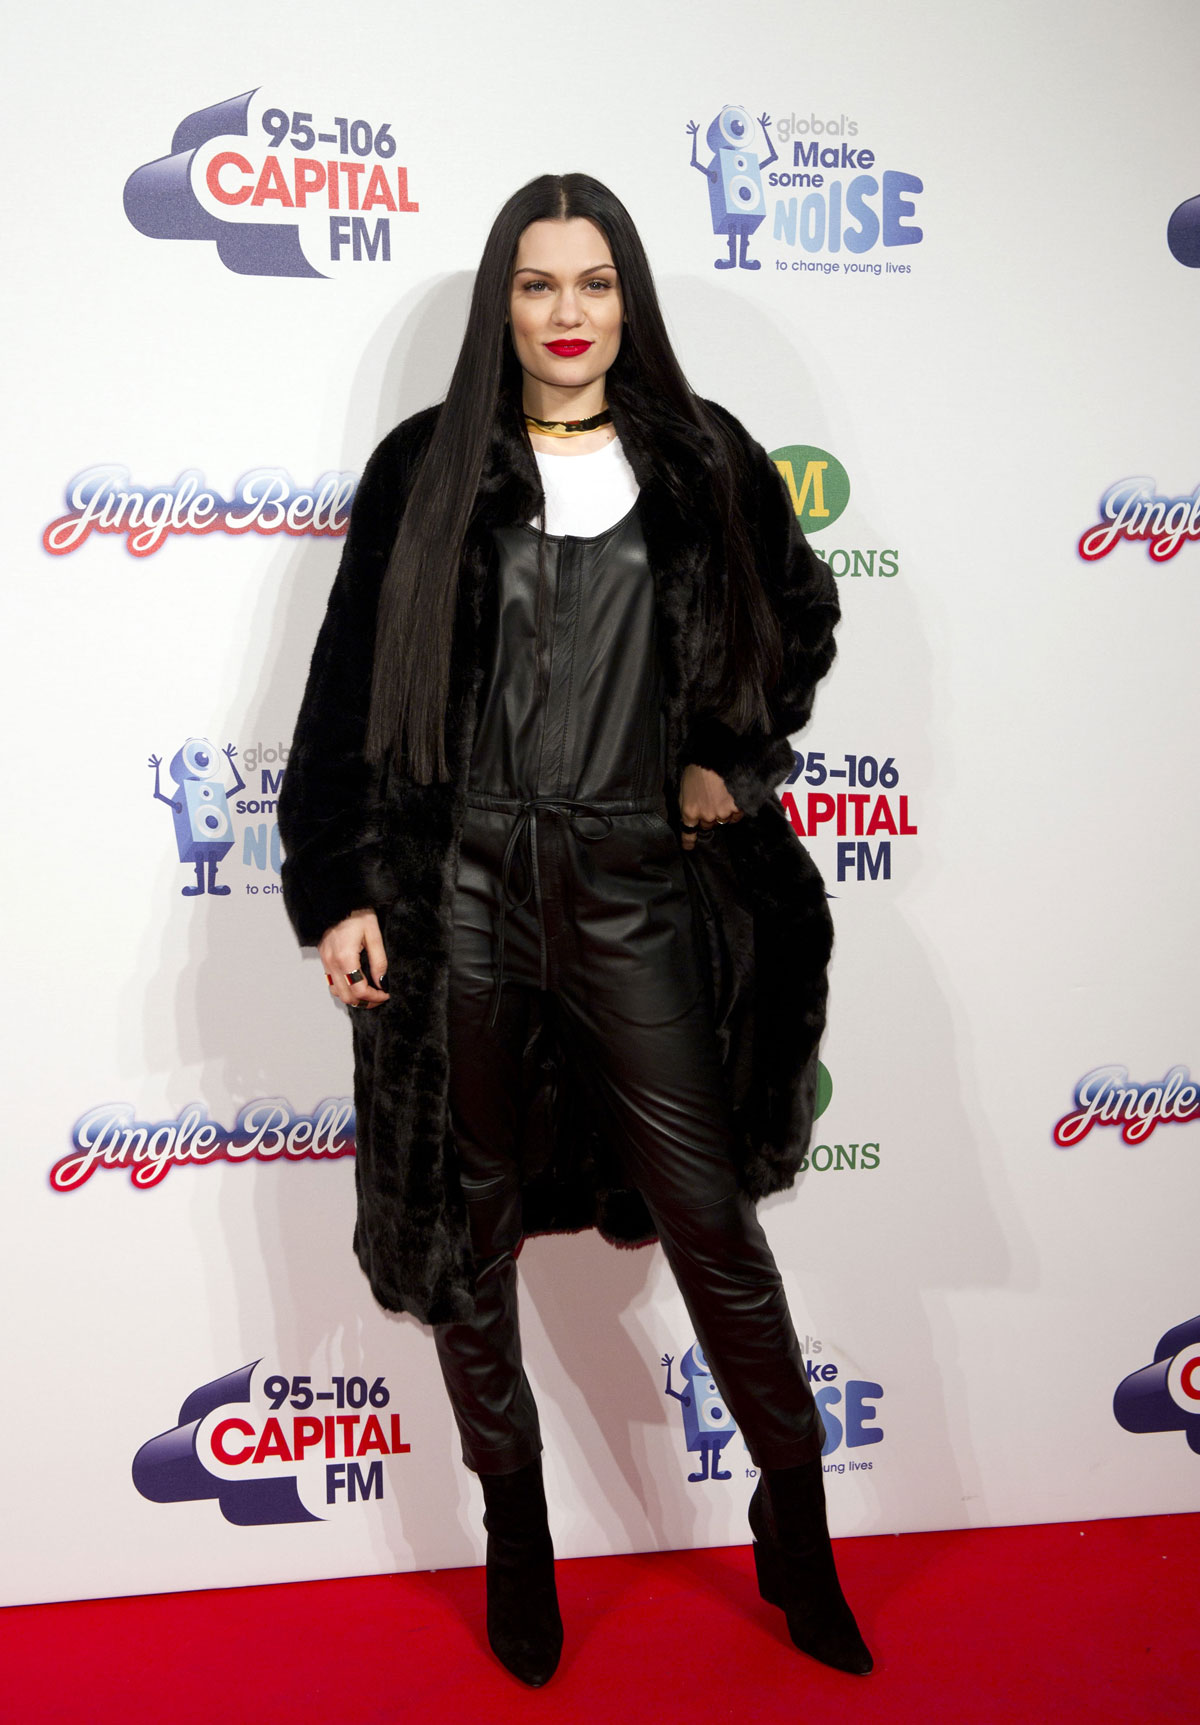 Jessie J attends Jingle Bell Ball day 2